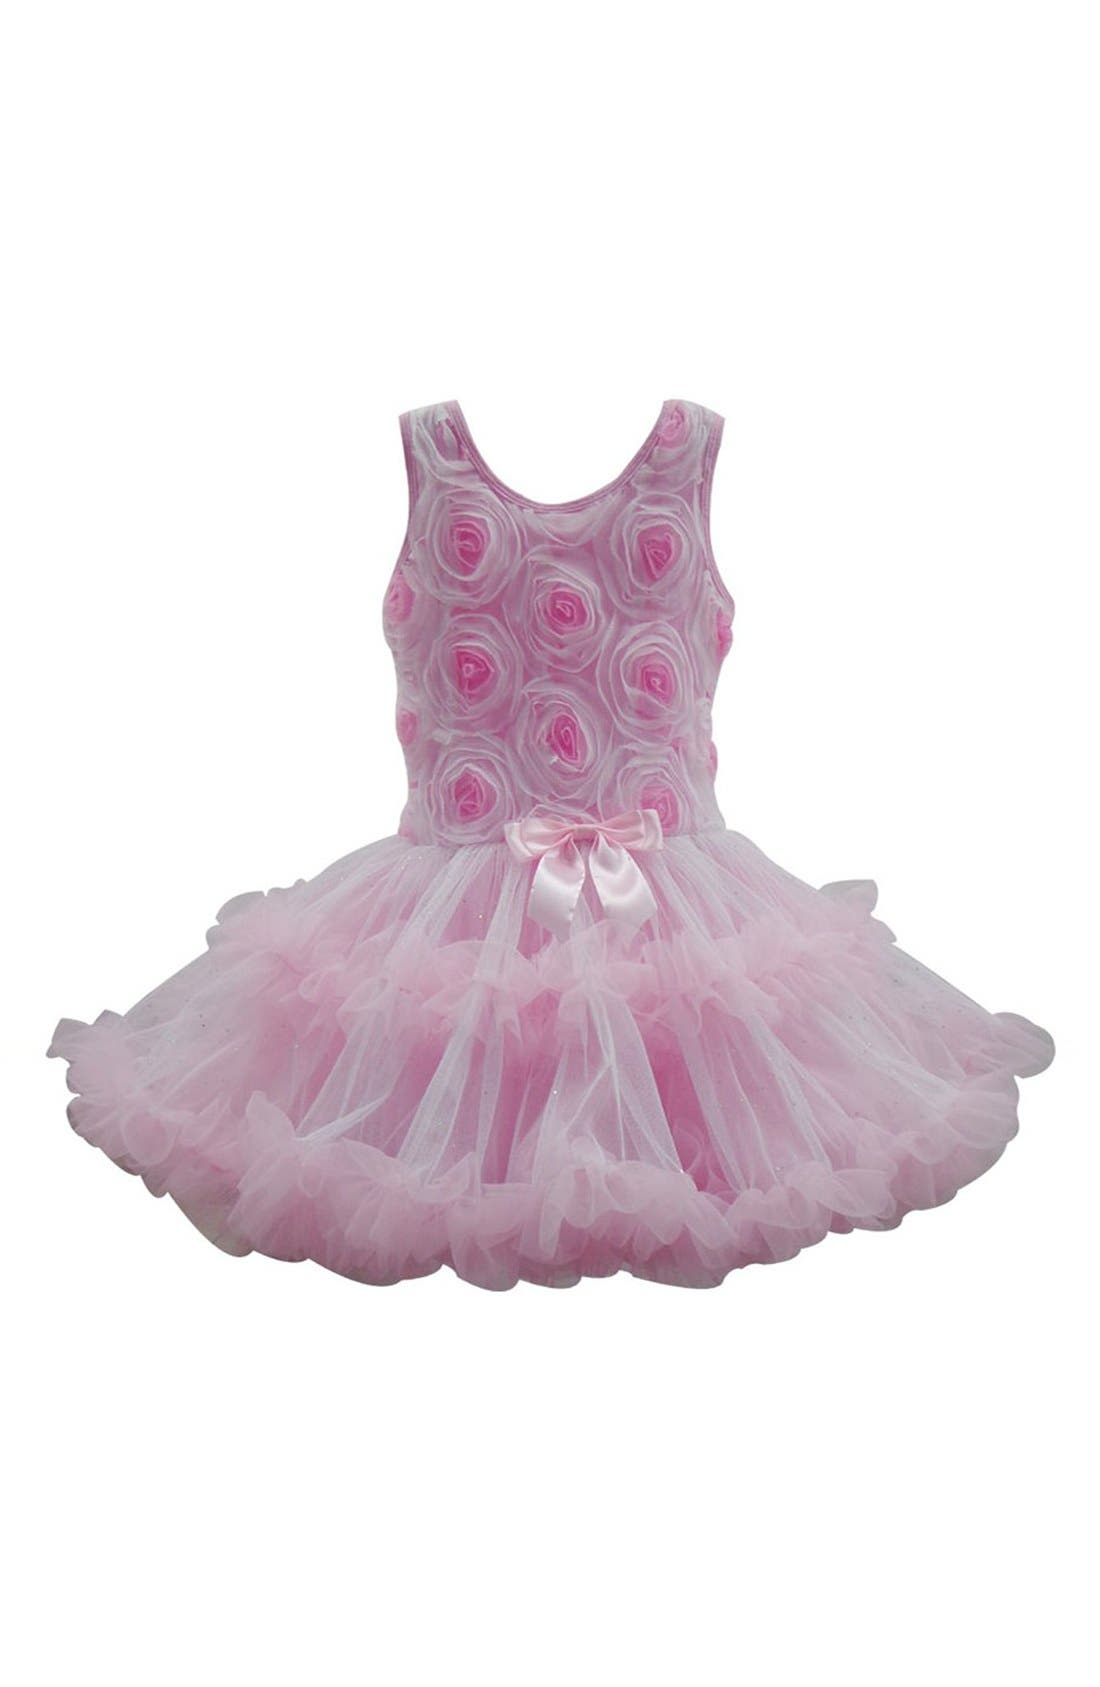 PopatuRibbon RosetteFlower Petidress(BabyGirls)